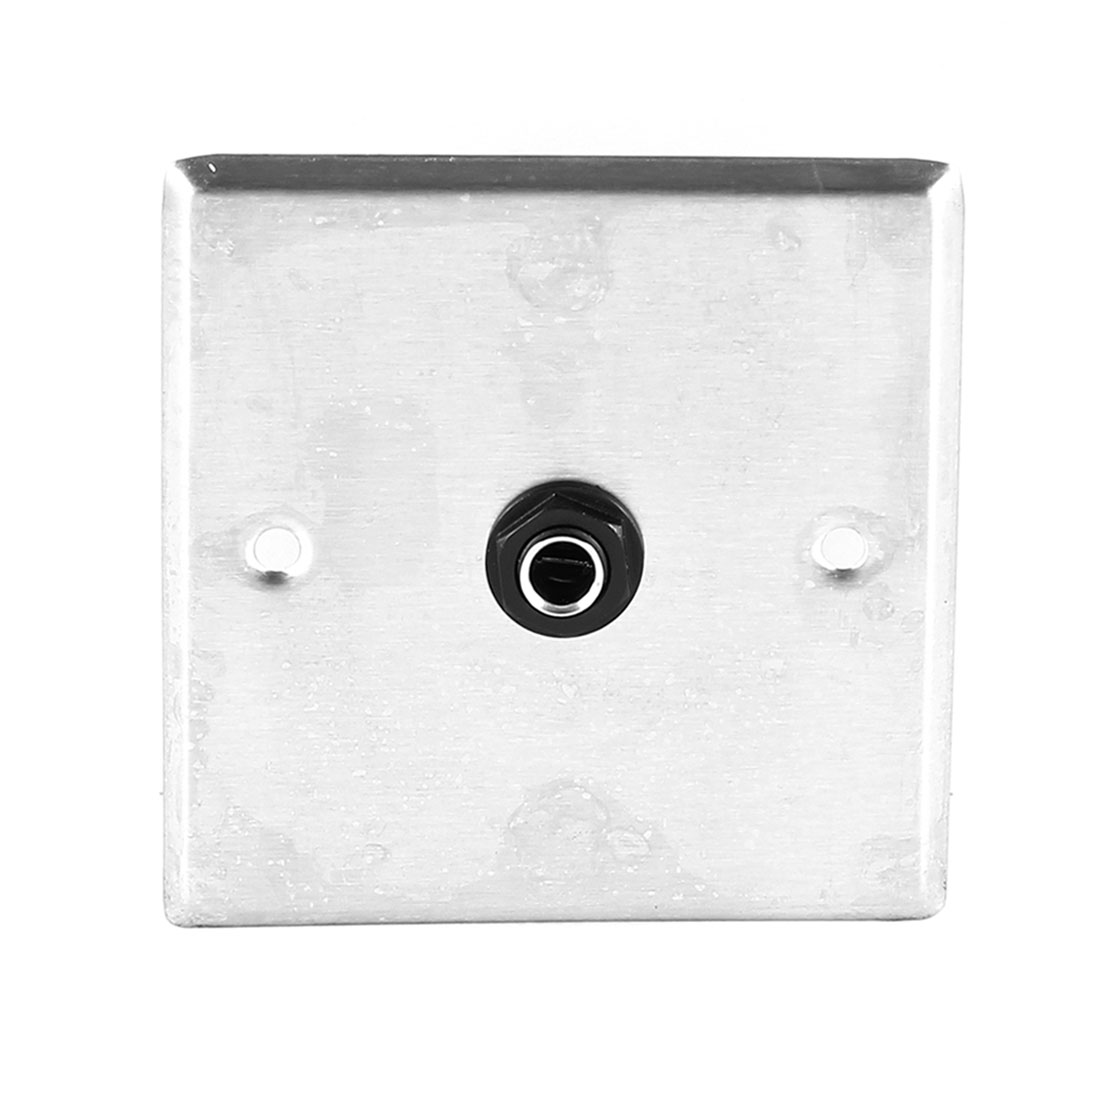 "Metal 6.35mm 1/4"" Socket Jack Microphone Mic Wall Plate Panel 85mm x 85mm"